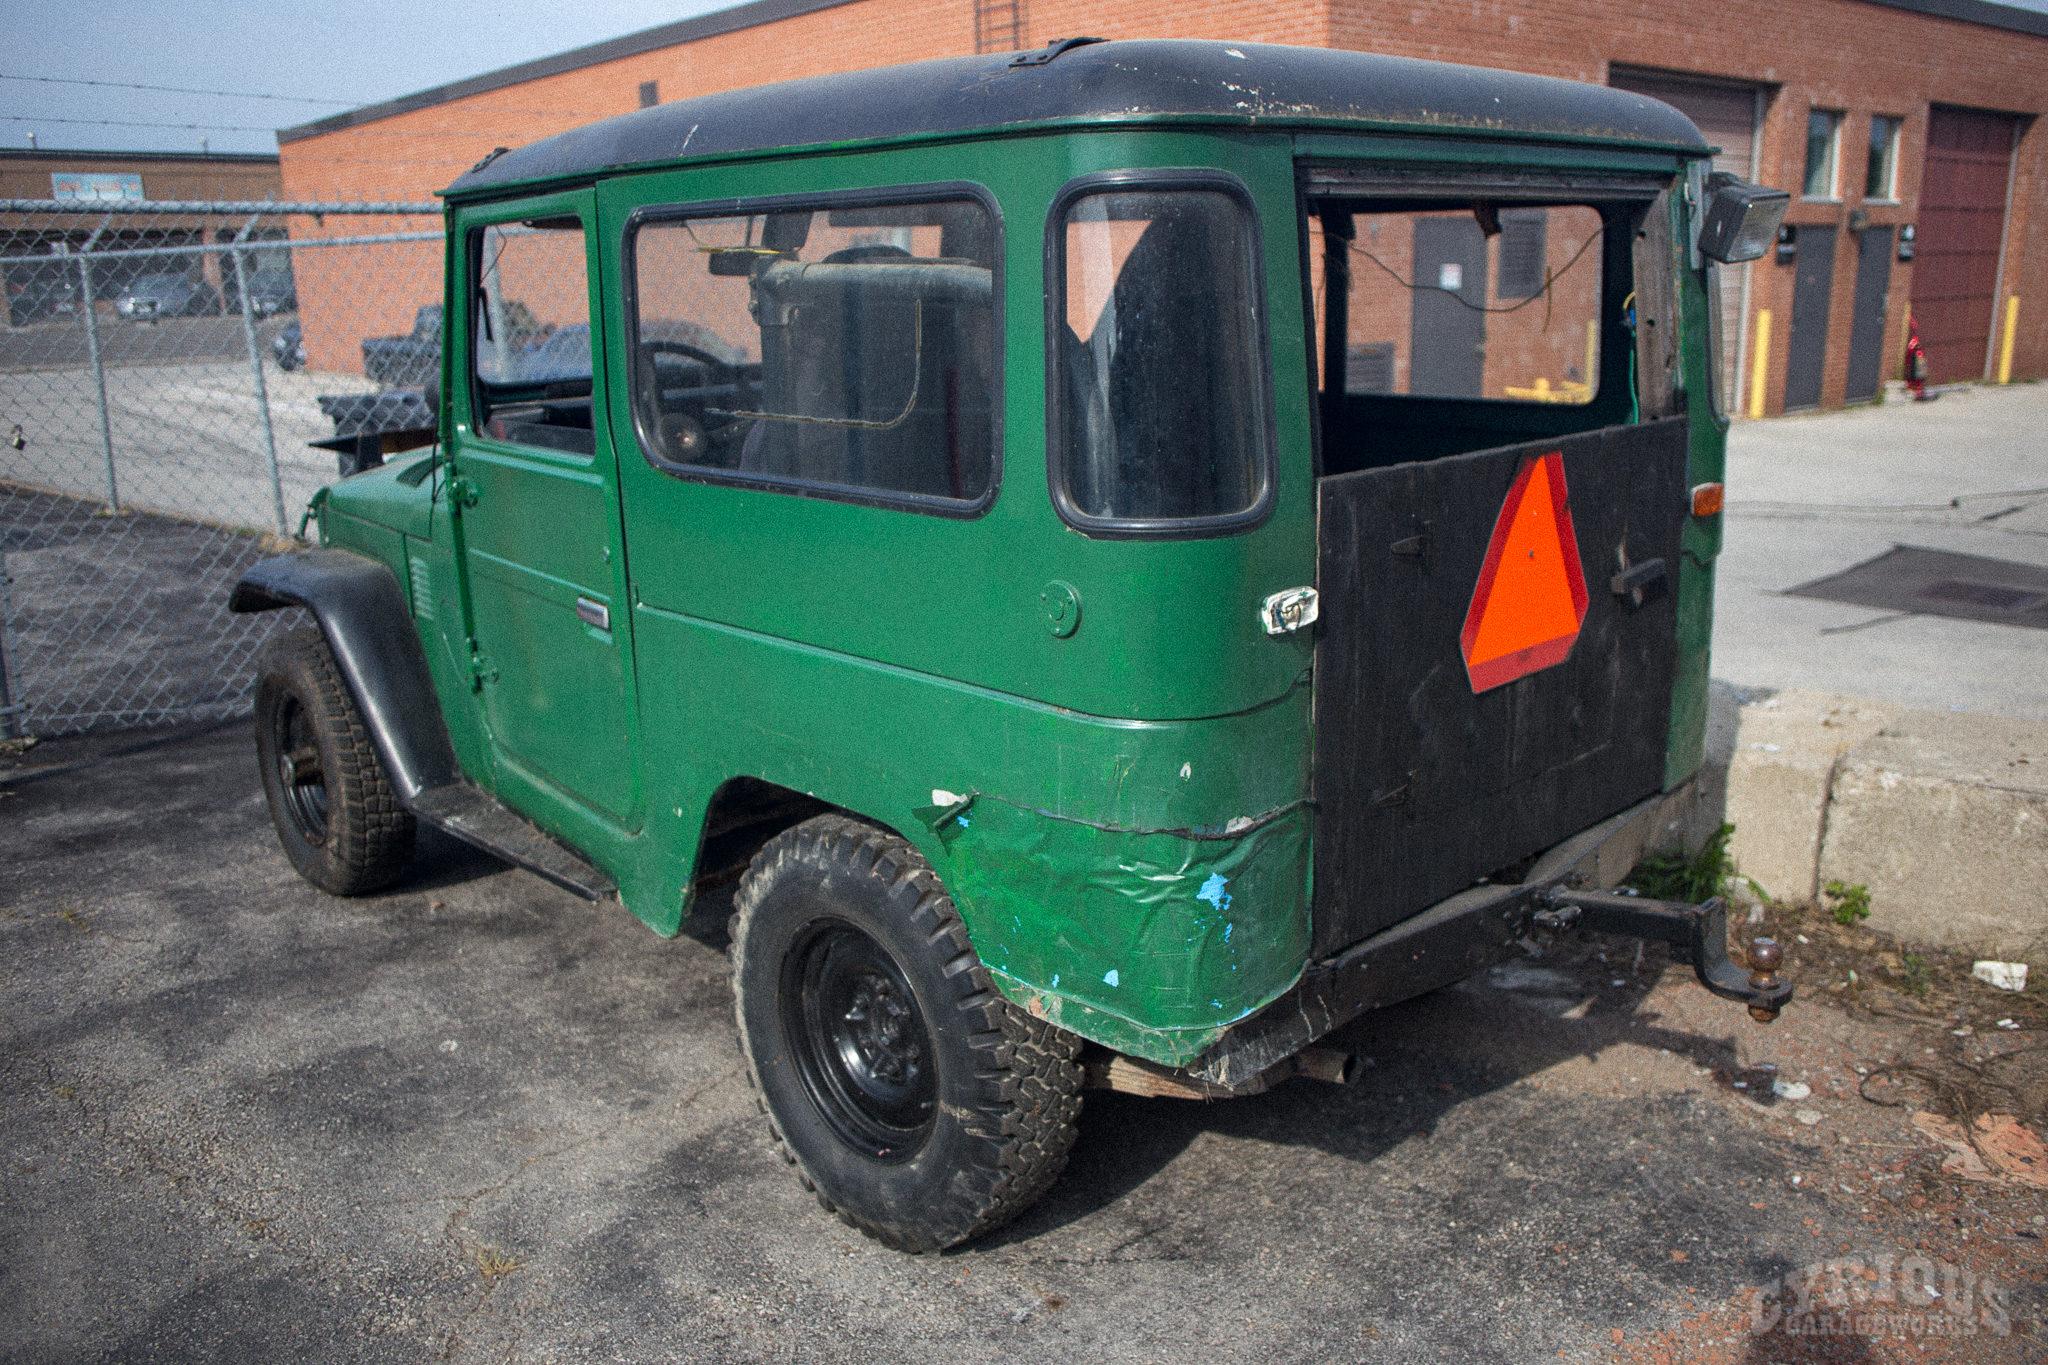 FJ40 Restoration – Clean Off-Road Machine – Part 1 – Cyrious Garageworks